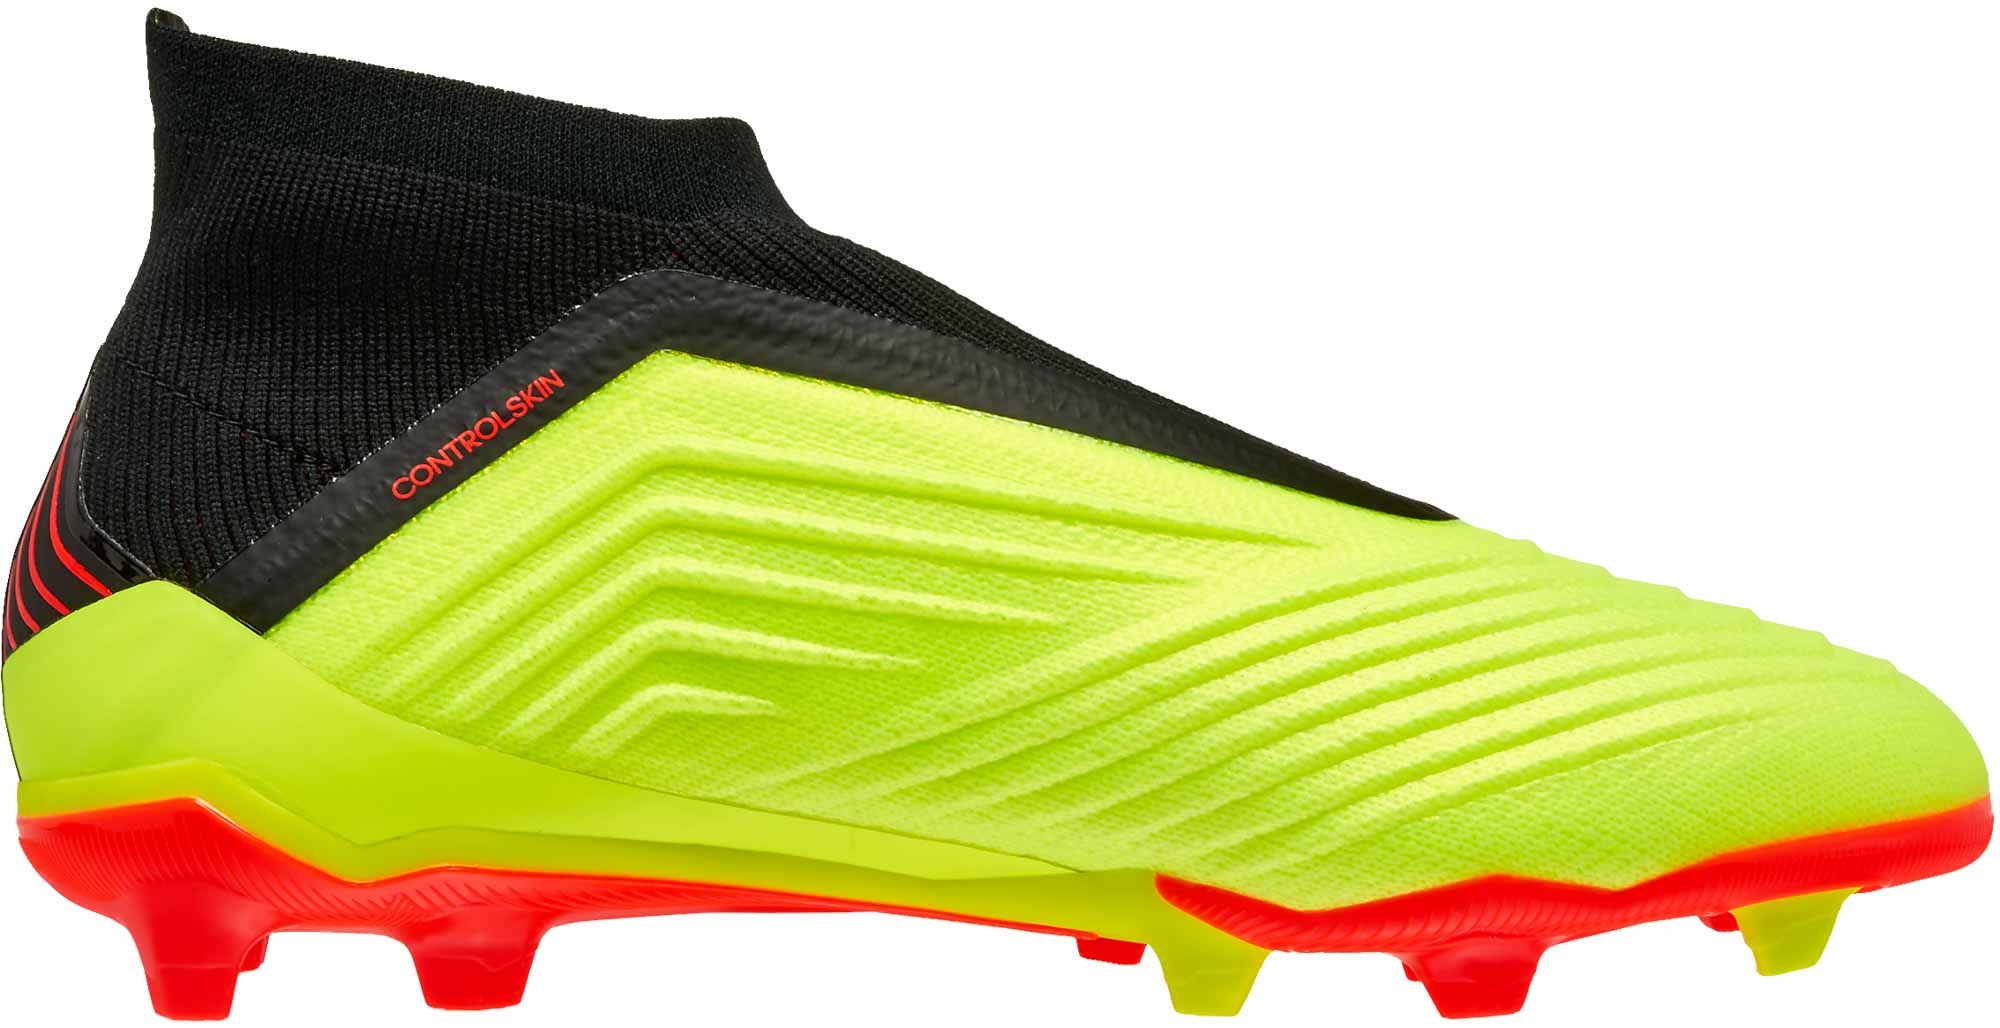 factory authentic 7a55c d304a adidas Predator 18 FG – Youth – Solar YellowBlackSolar Red